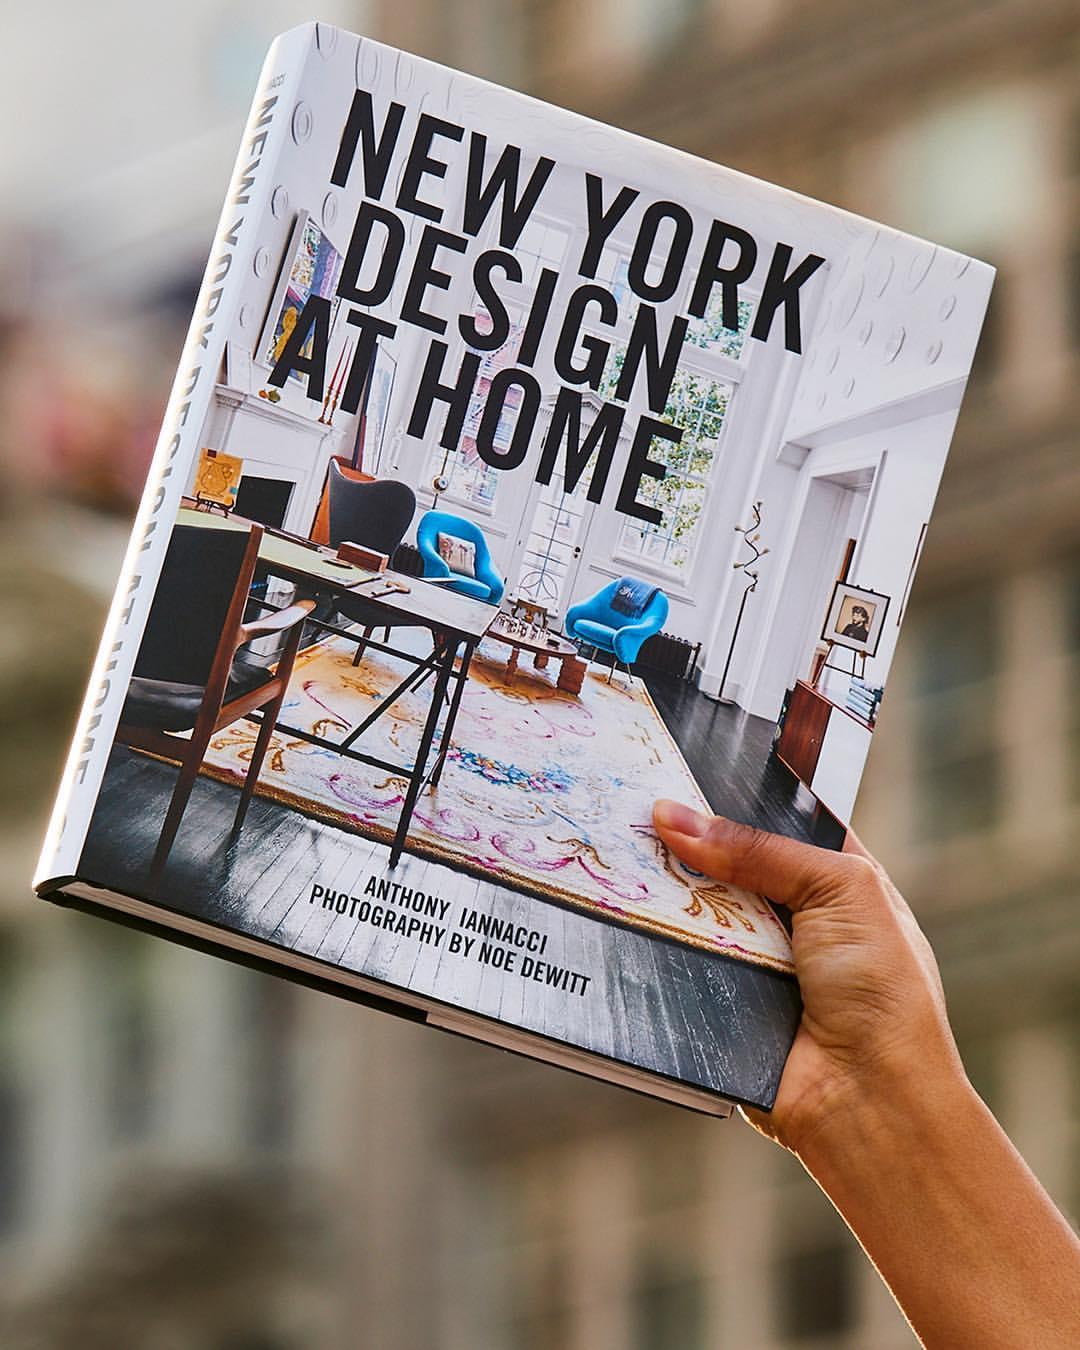 new york design at home.jpg